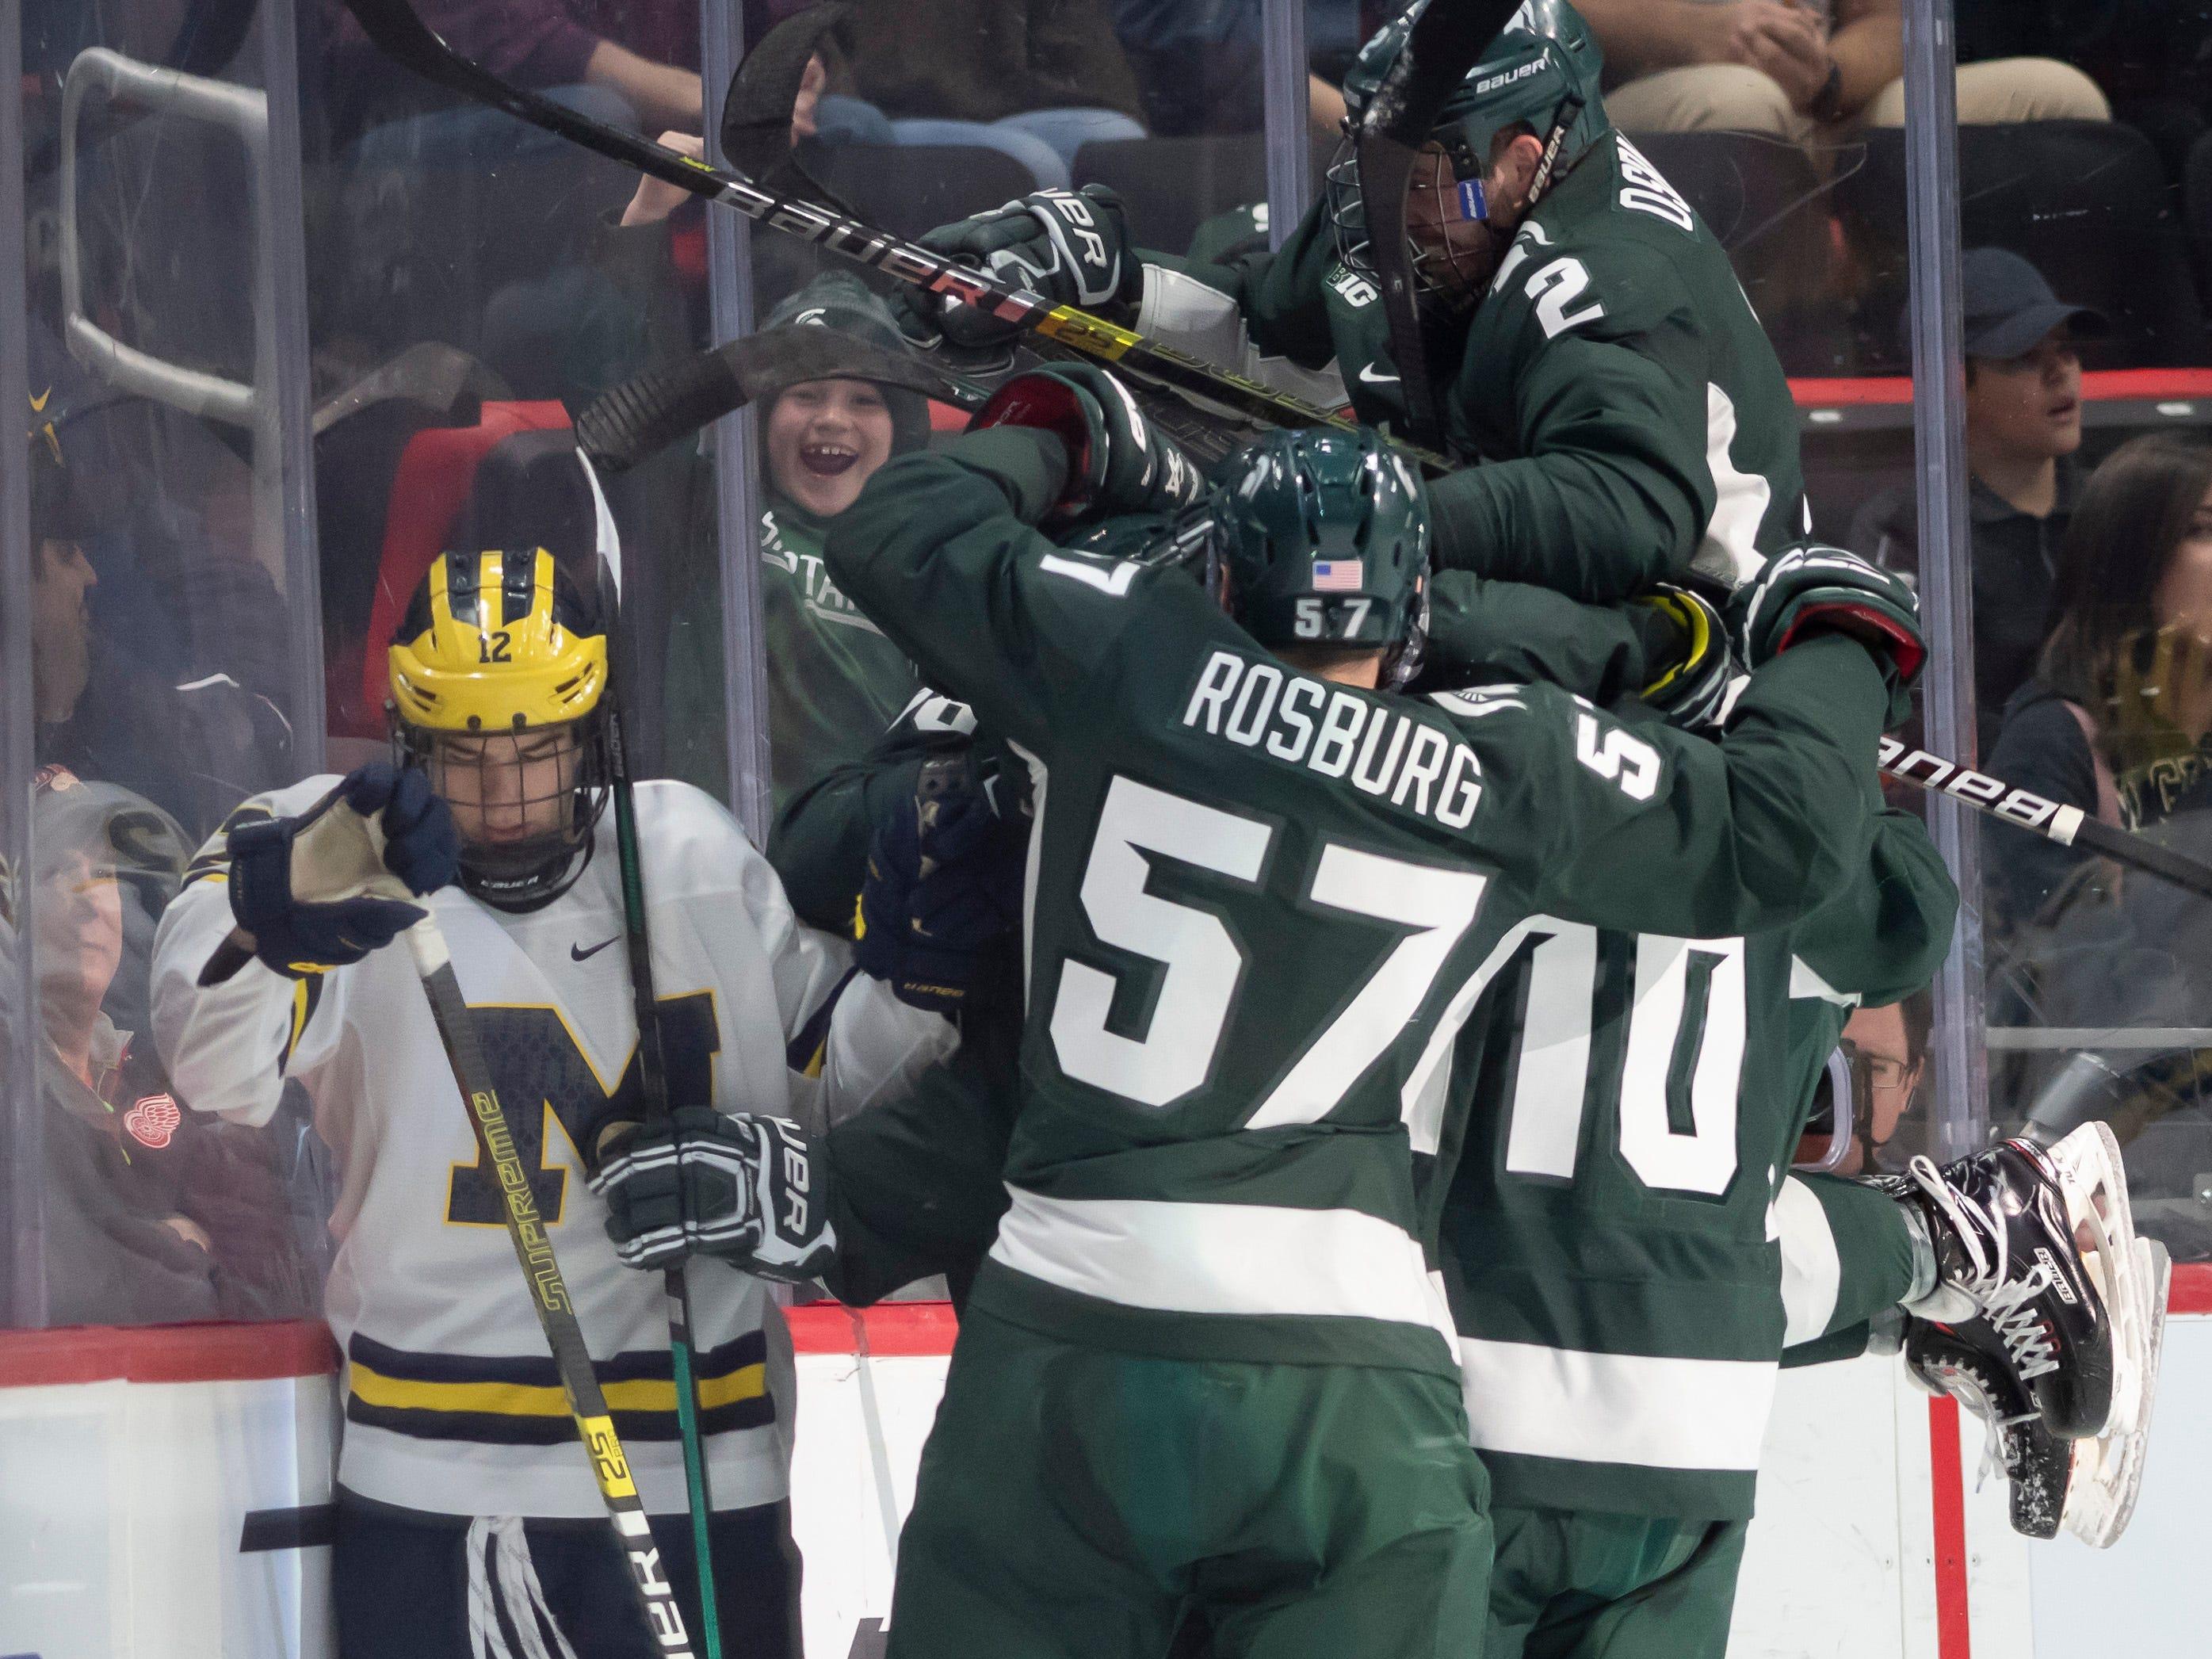 Michigan forward Dakota Raabe skates away as Michigan State celebrates a goal by Wojciech Stachowiak in the first period.